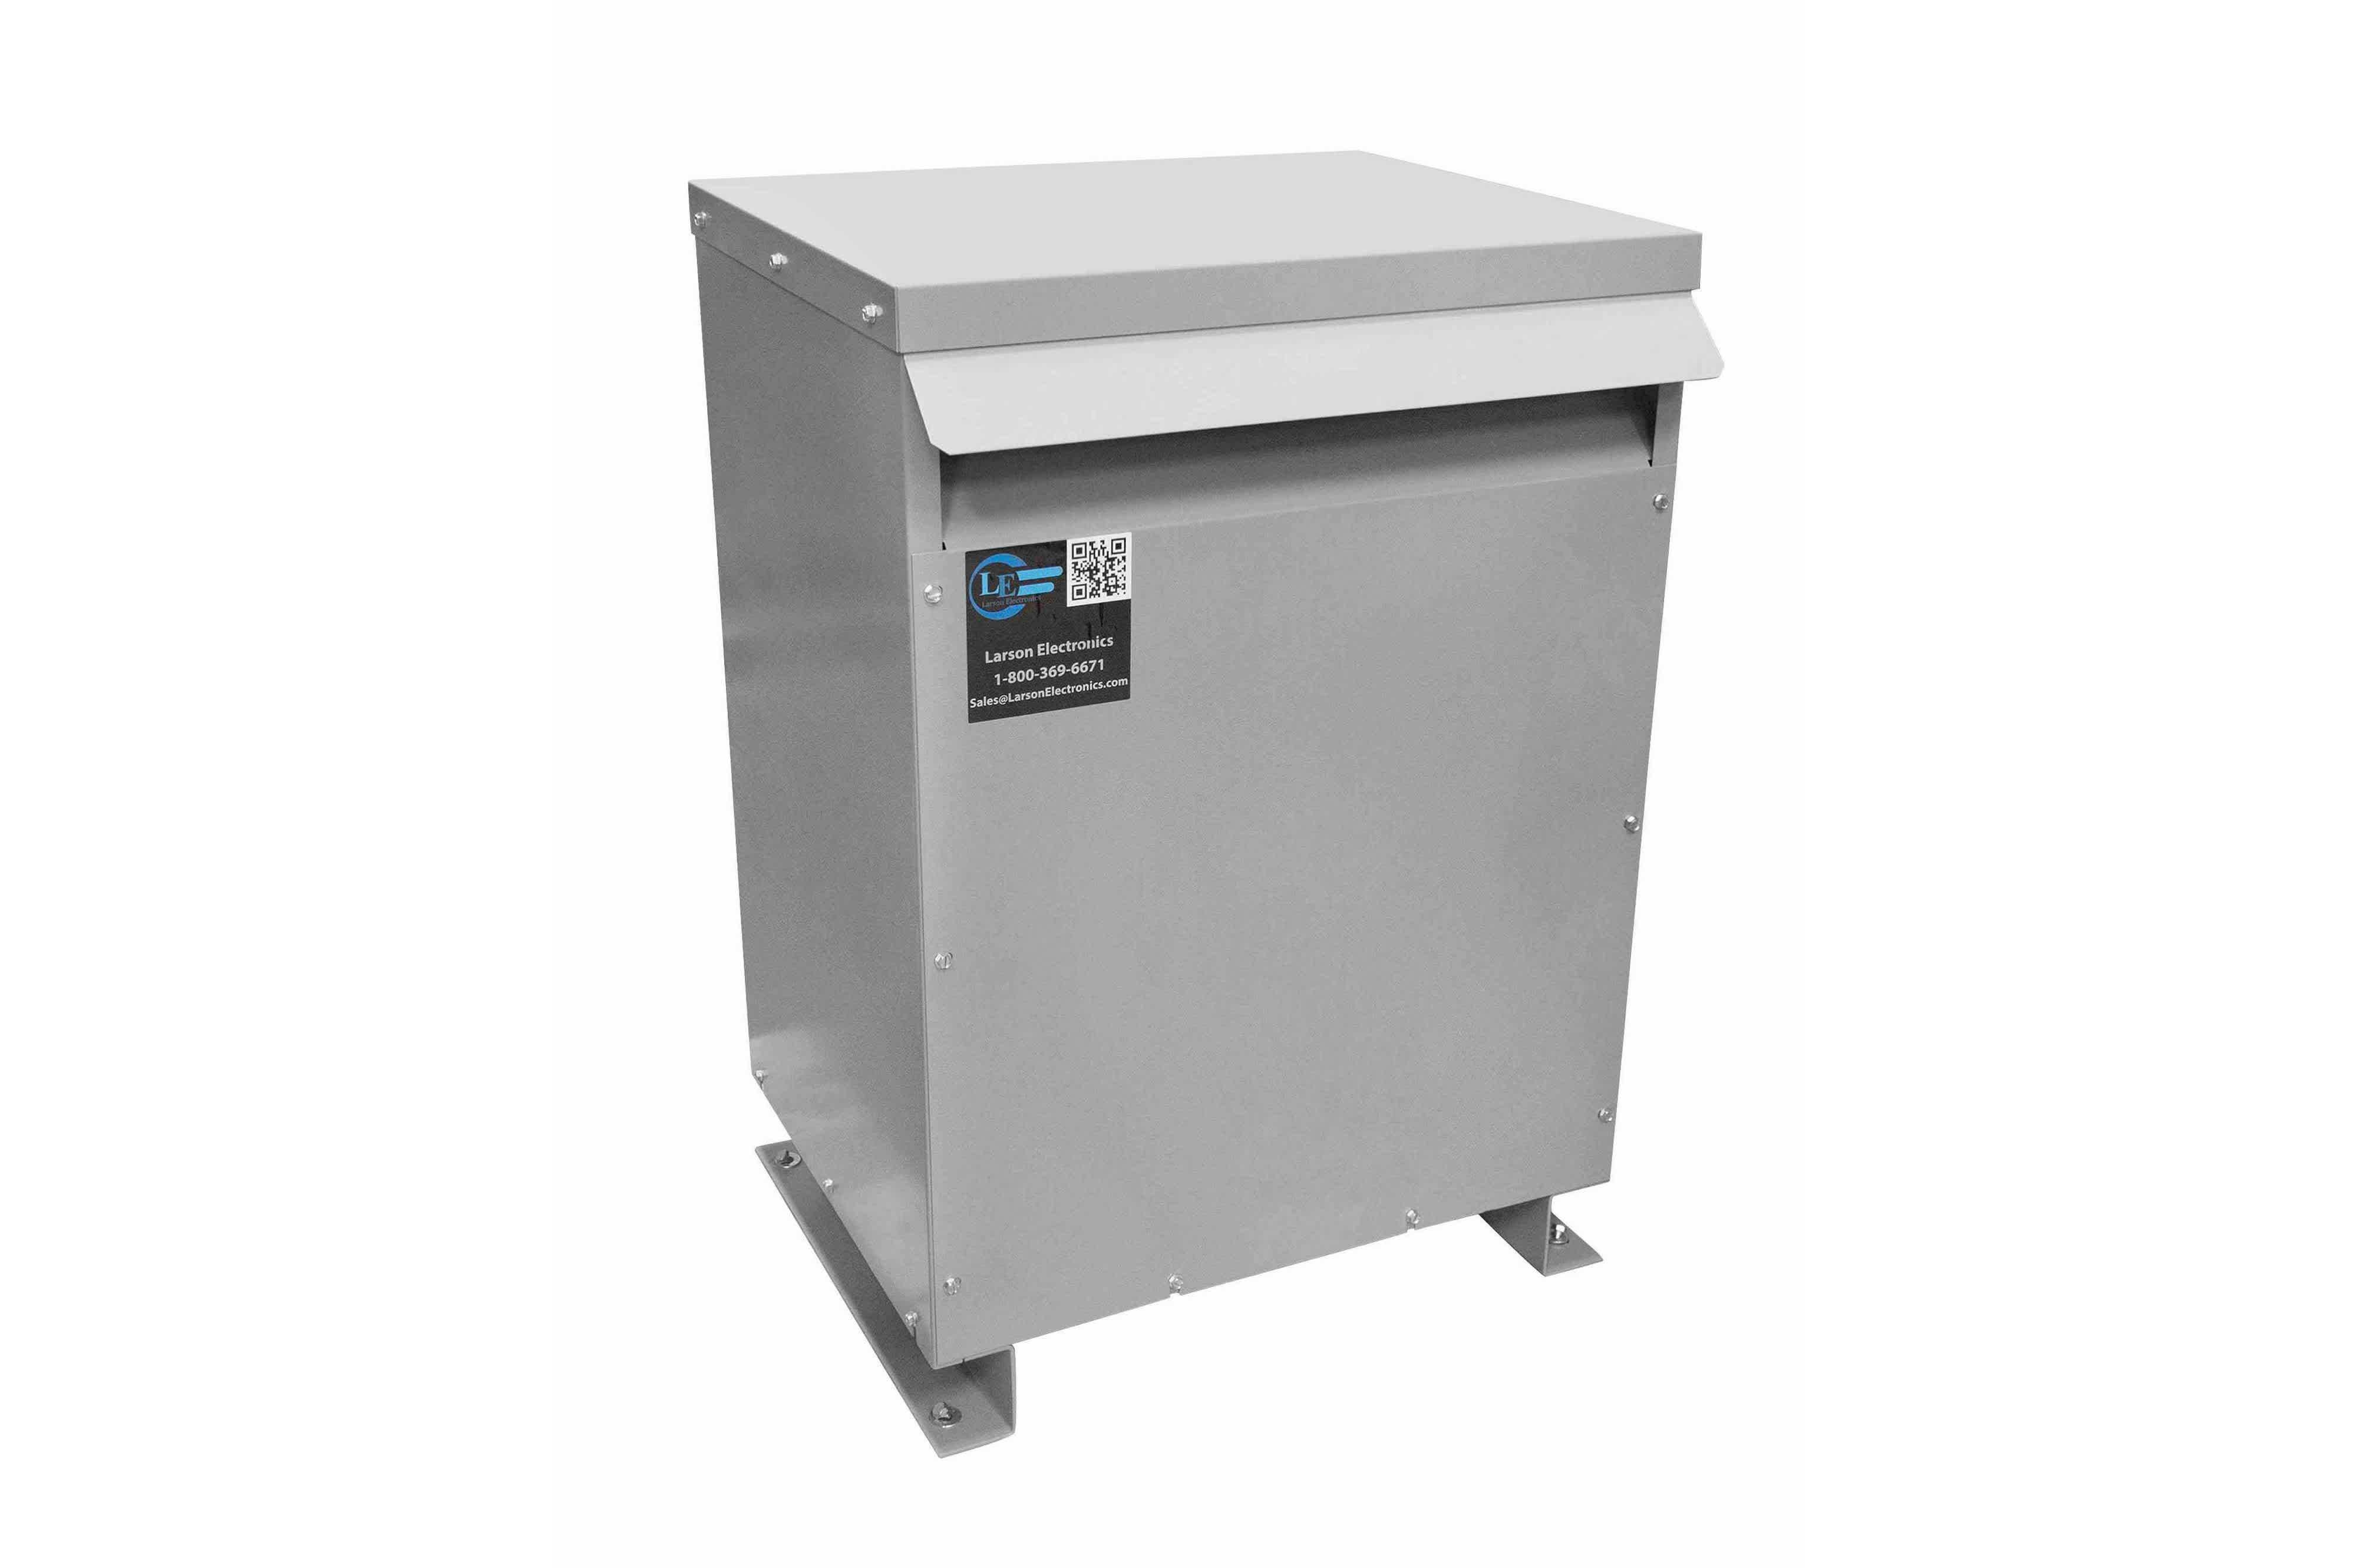 225 kVA 3PH Isolation Transformer, 575V Wye Primary, 240V/120 Delta Secondary, N3R, Ventilated, 60 Hz